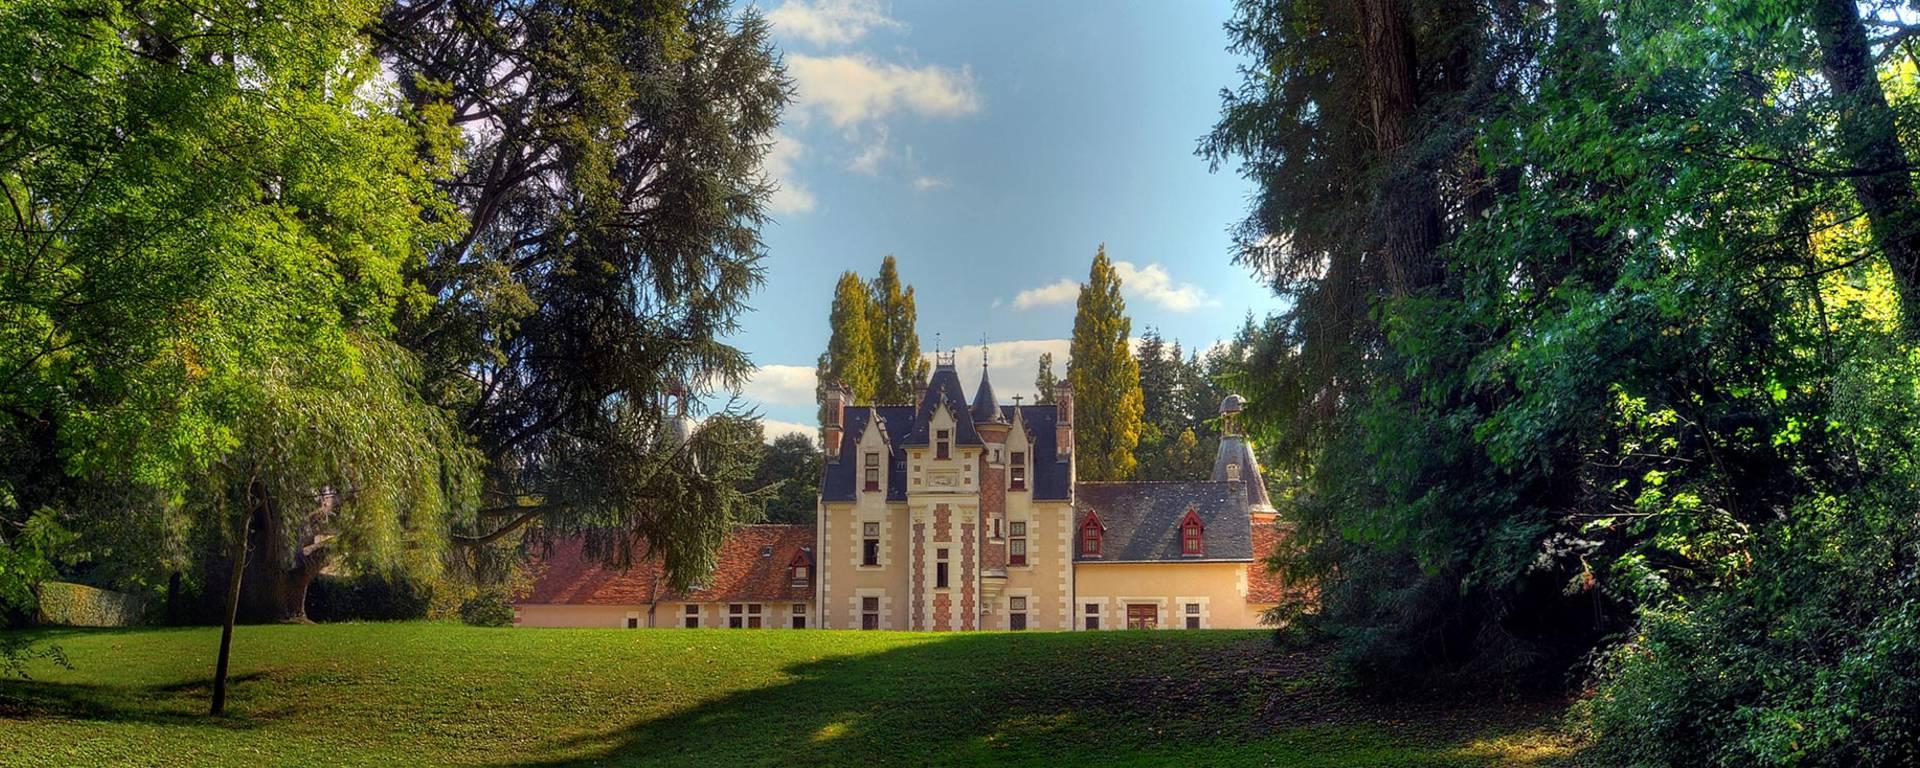 The grounds of the Château de Troussay